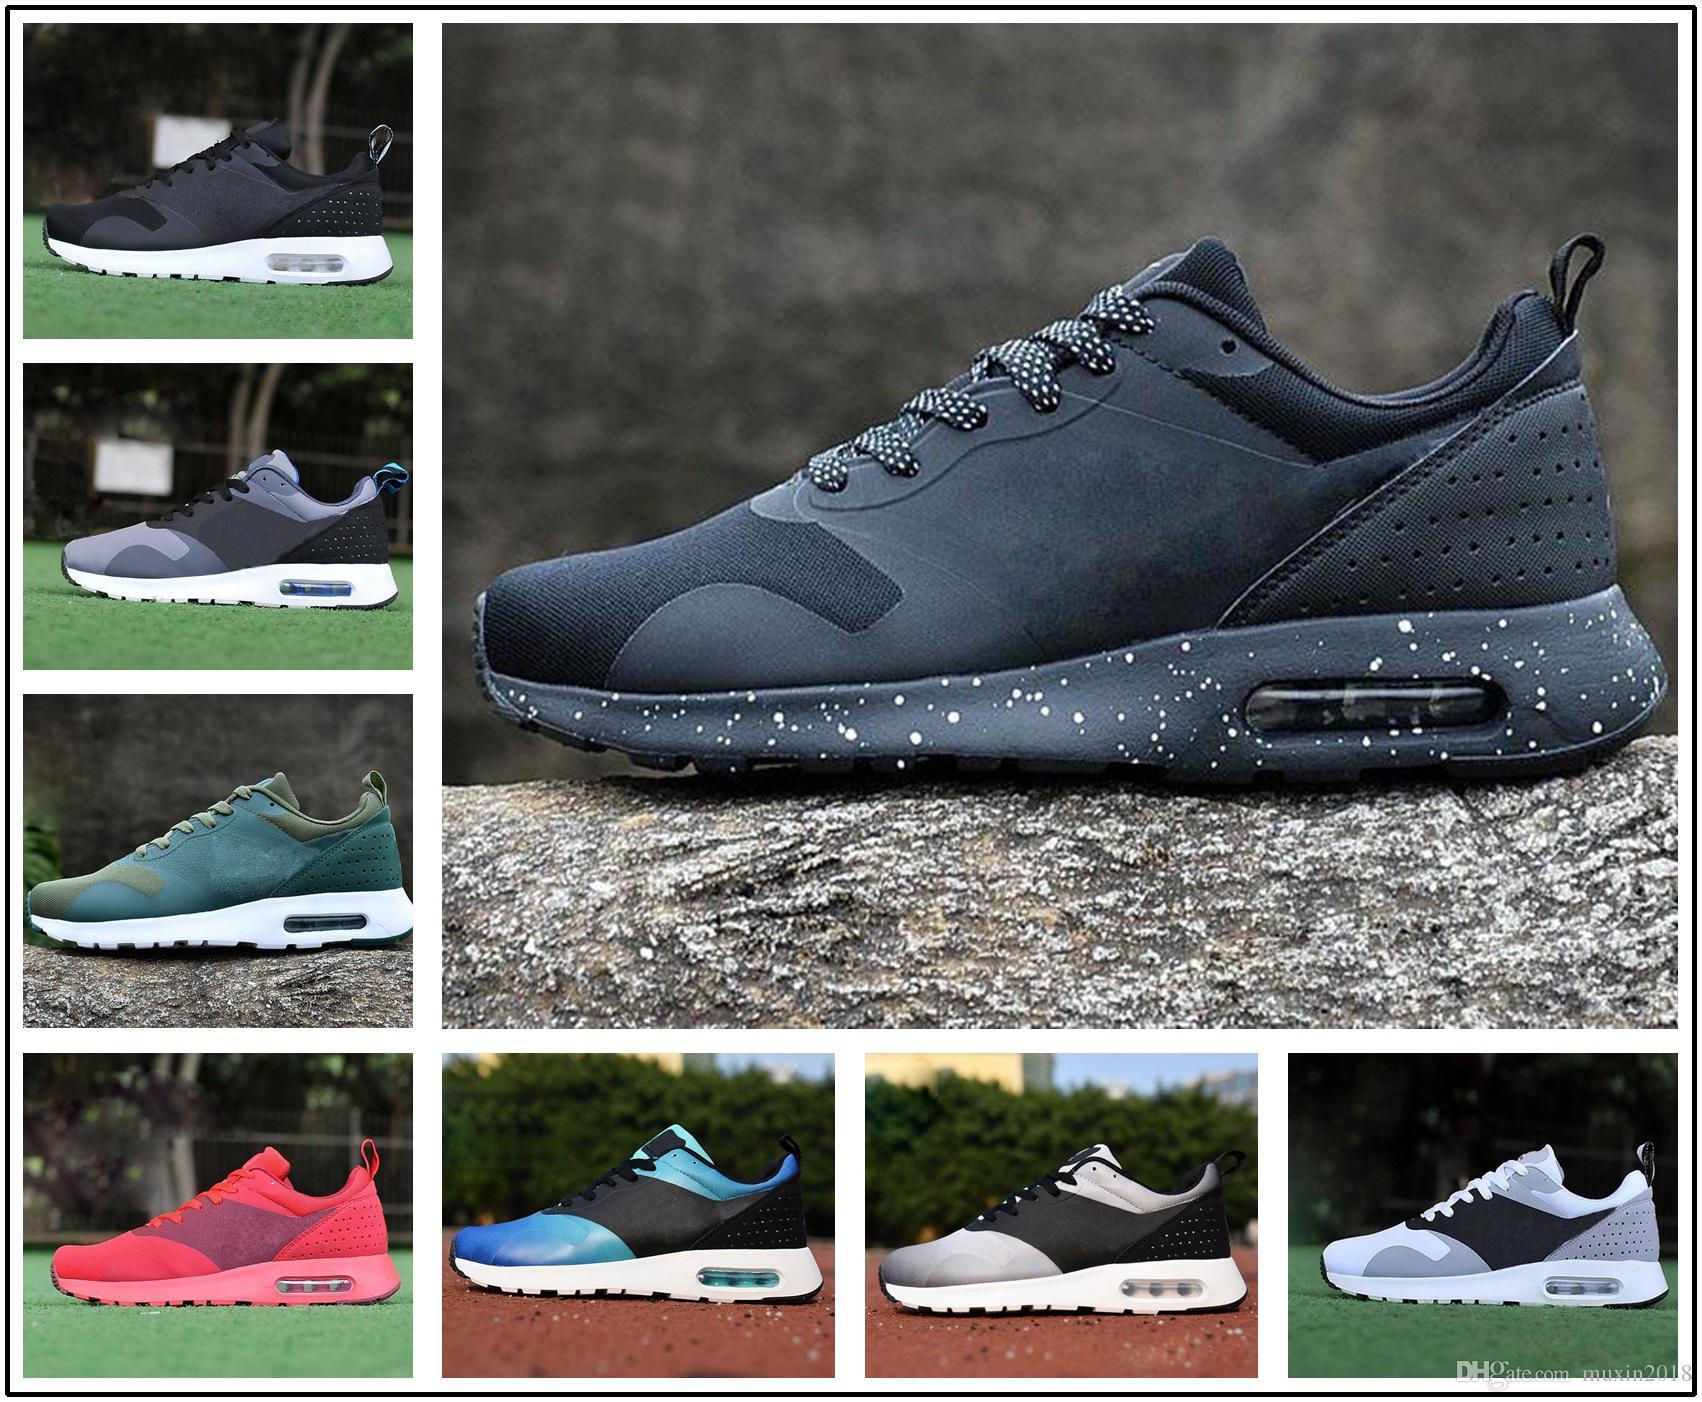 cheaper 316a2 72ca2 Acquista Nike Air Max 87 90 Airmax 87 90 2017 2018 87 Tavas Camouflage Uomo  RUNNING Scarpe 100% Originale All Black Thea Sport Shoe 2017 Hot Scarpe Da  ...